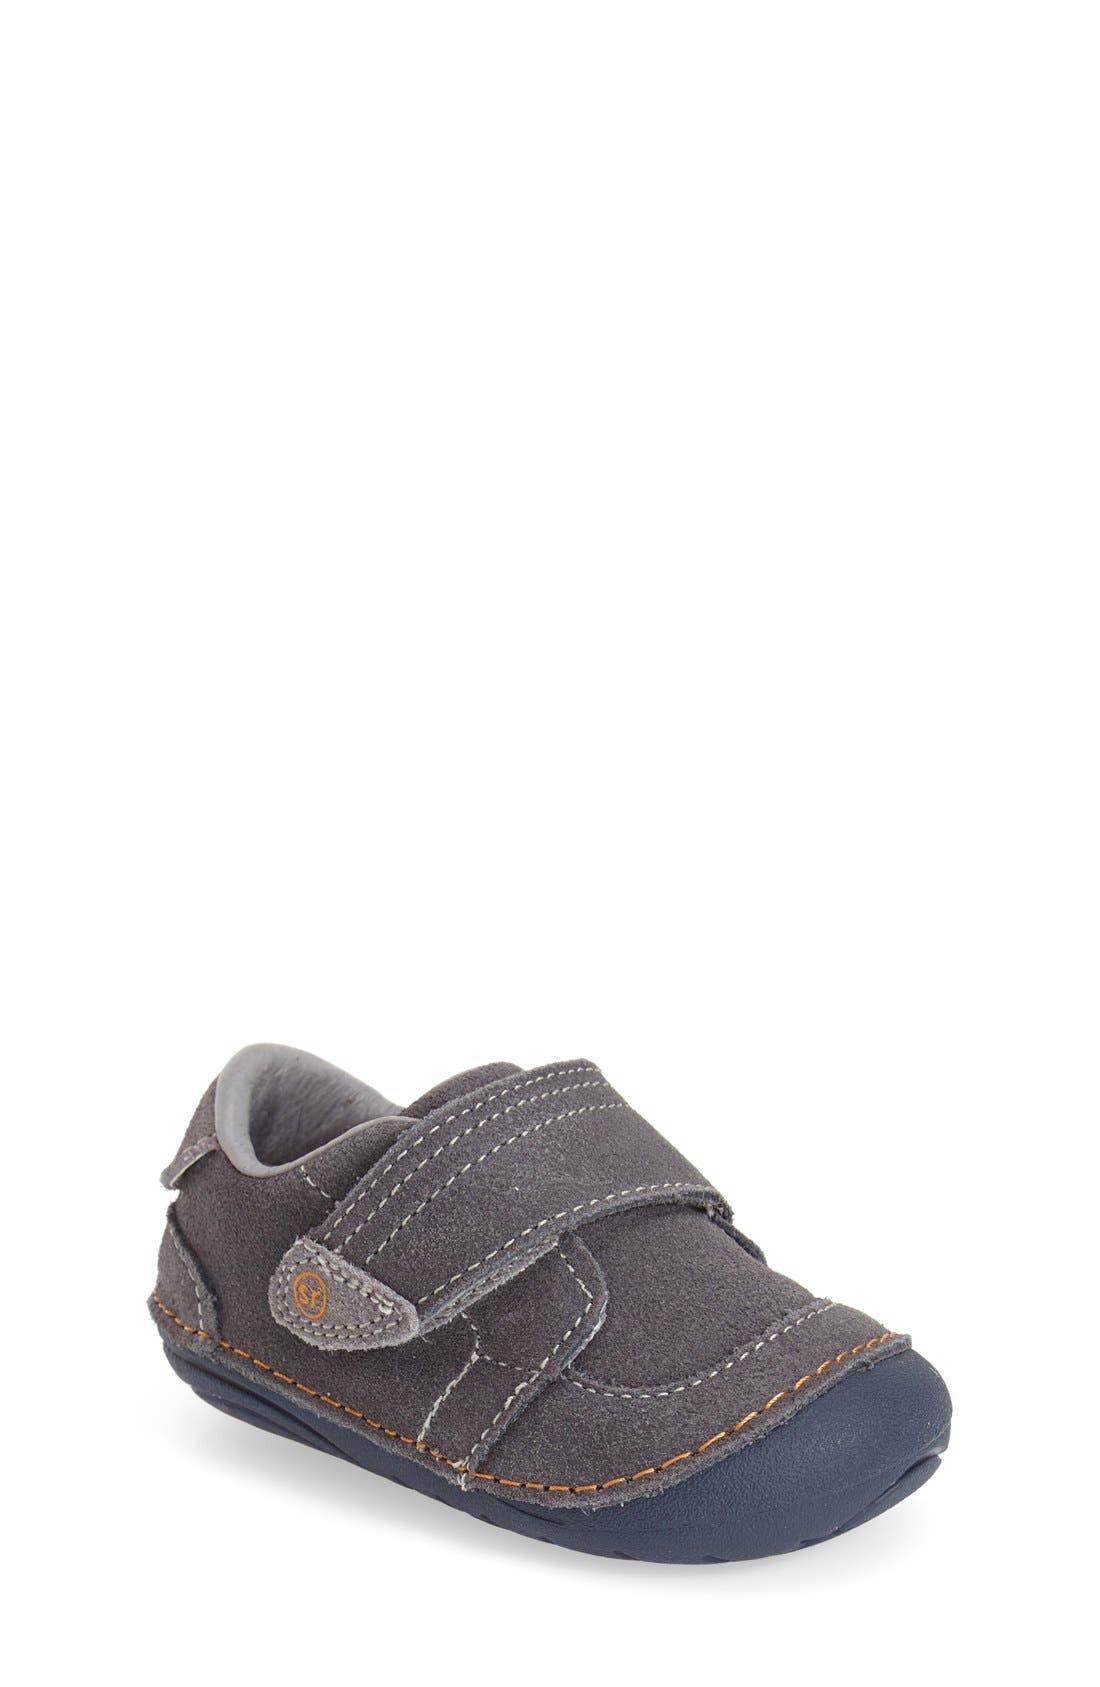 STRIDE RITE, Soft Motion Kellen Sneaker, Main thumbnail 1, color, GREY